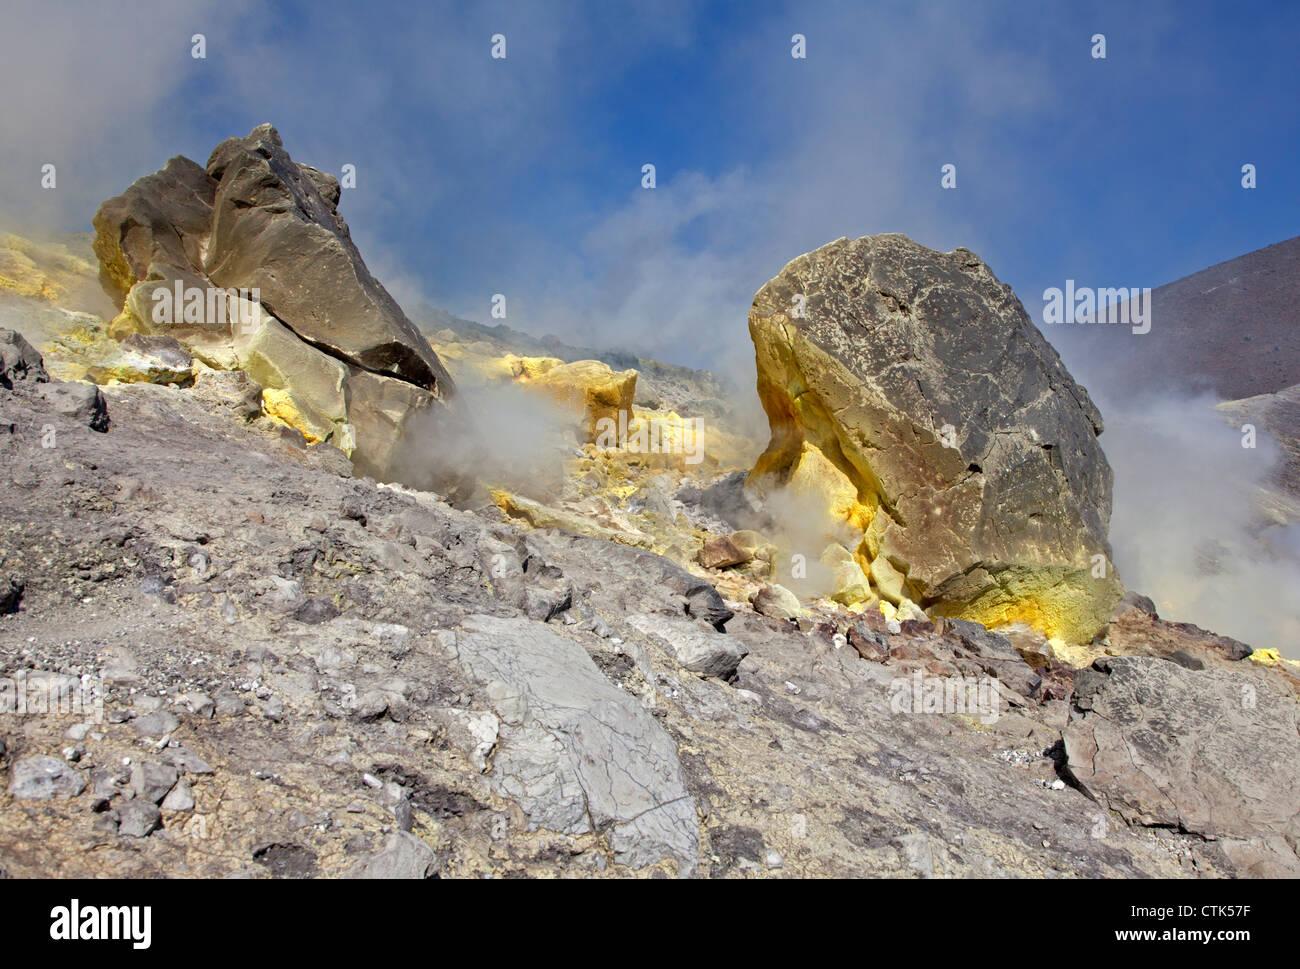 Sulphur at Vulcano Island, Aeolian Islands, Italy - Stock Image